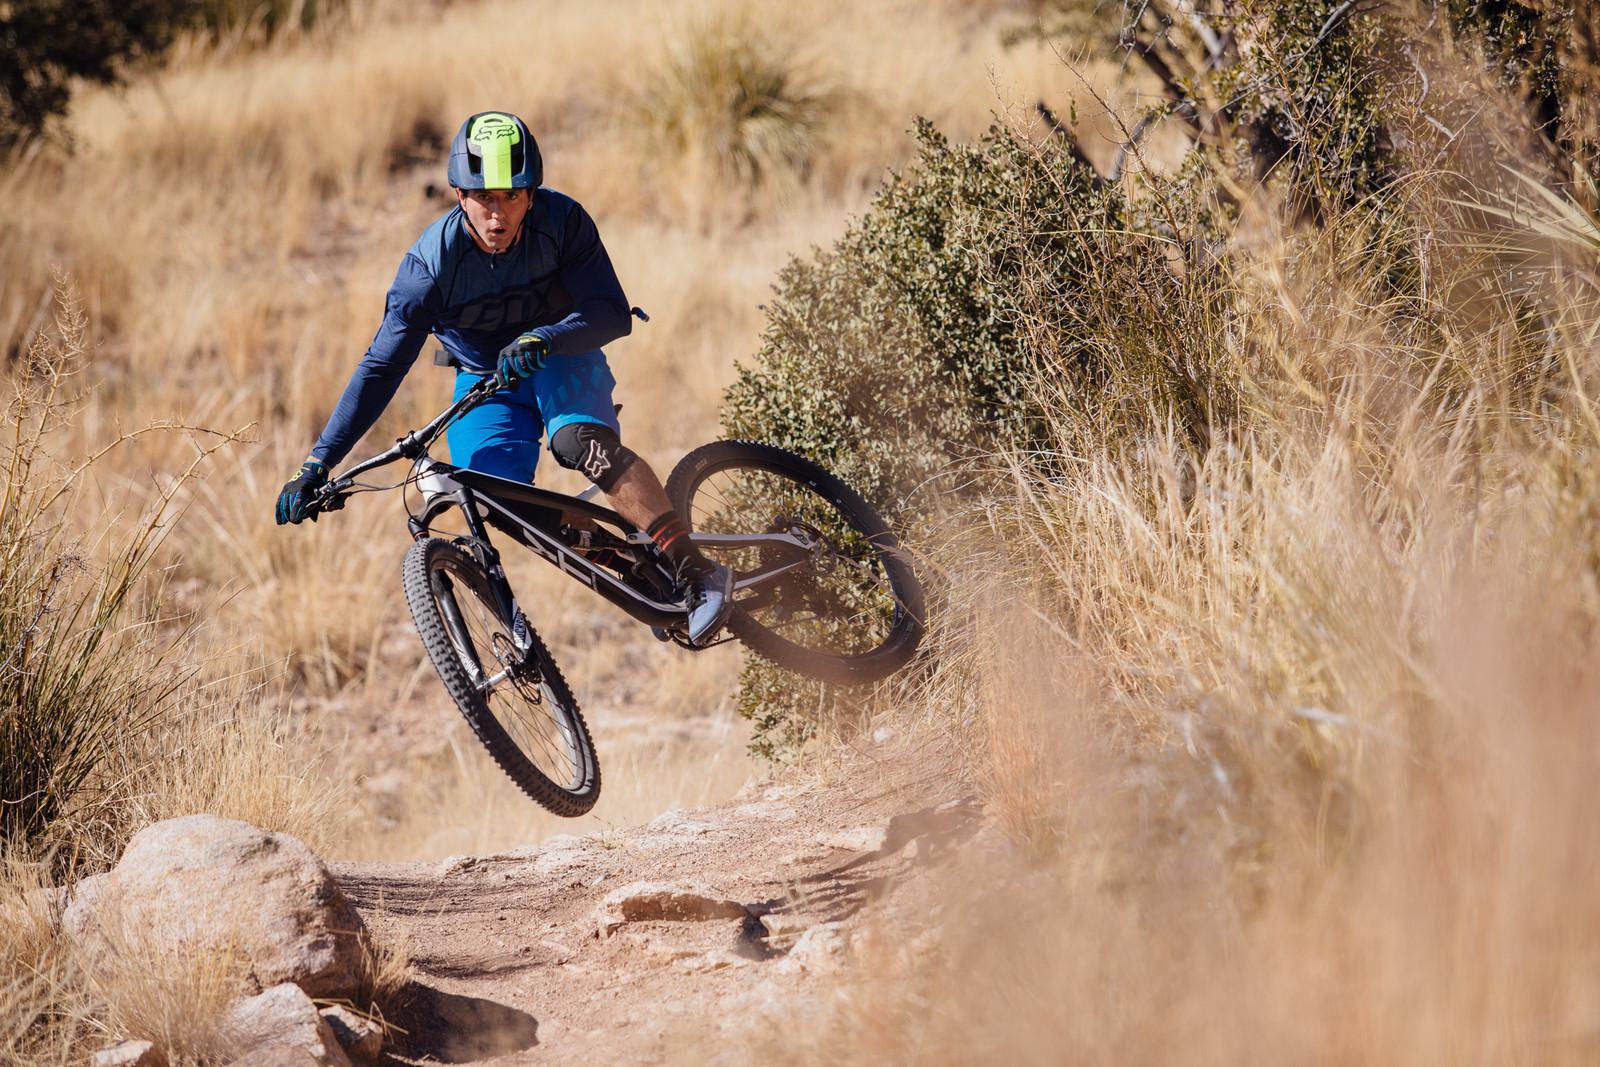 YT Jeffsy CF Comp 1 29- 2017 Vital MTB Test Sessions - YT Jeffsy CF Comp 1 29 - 2017 Vital MTB Test Sessions - Mountain Biking Pictures - Vital MTB